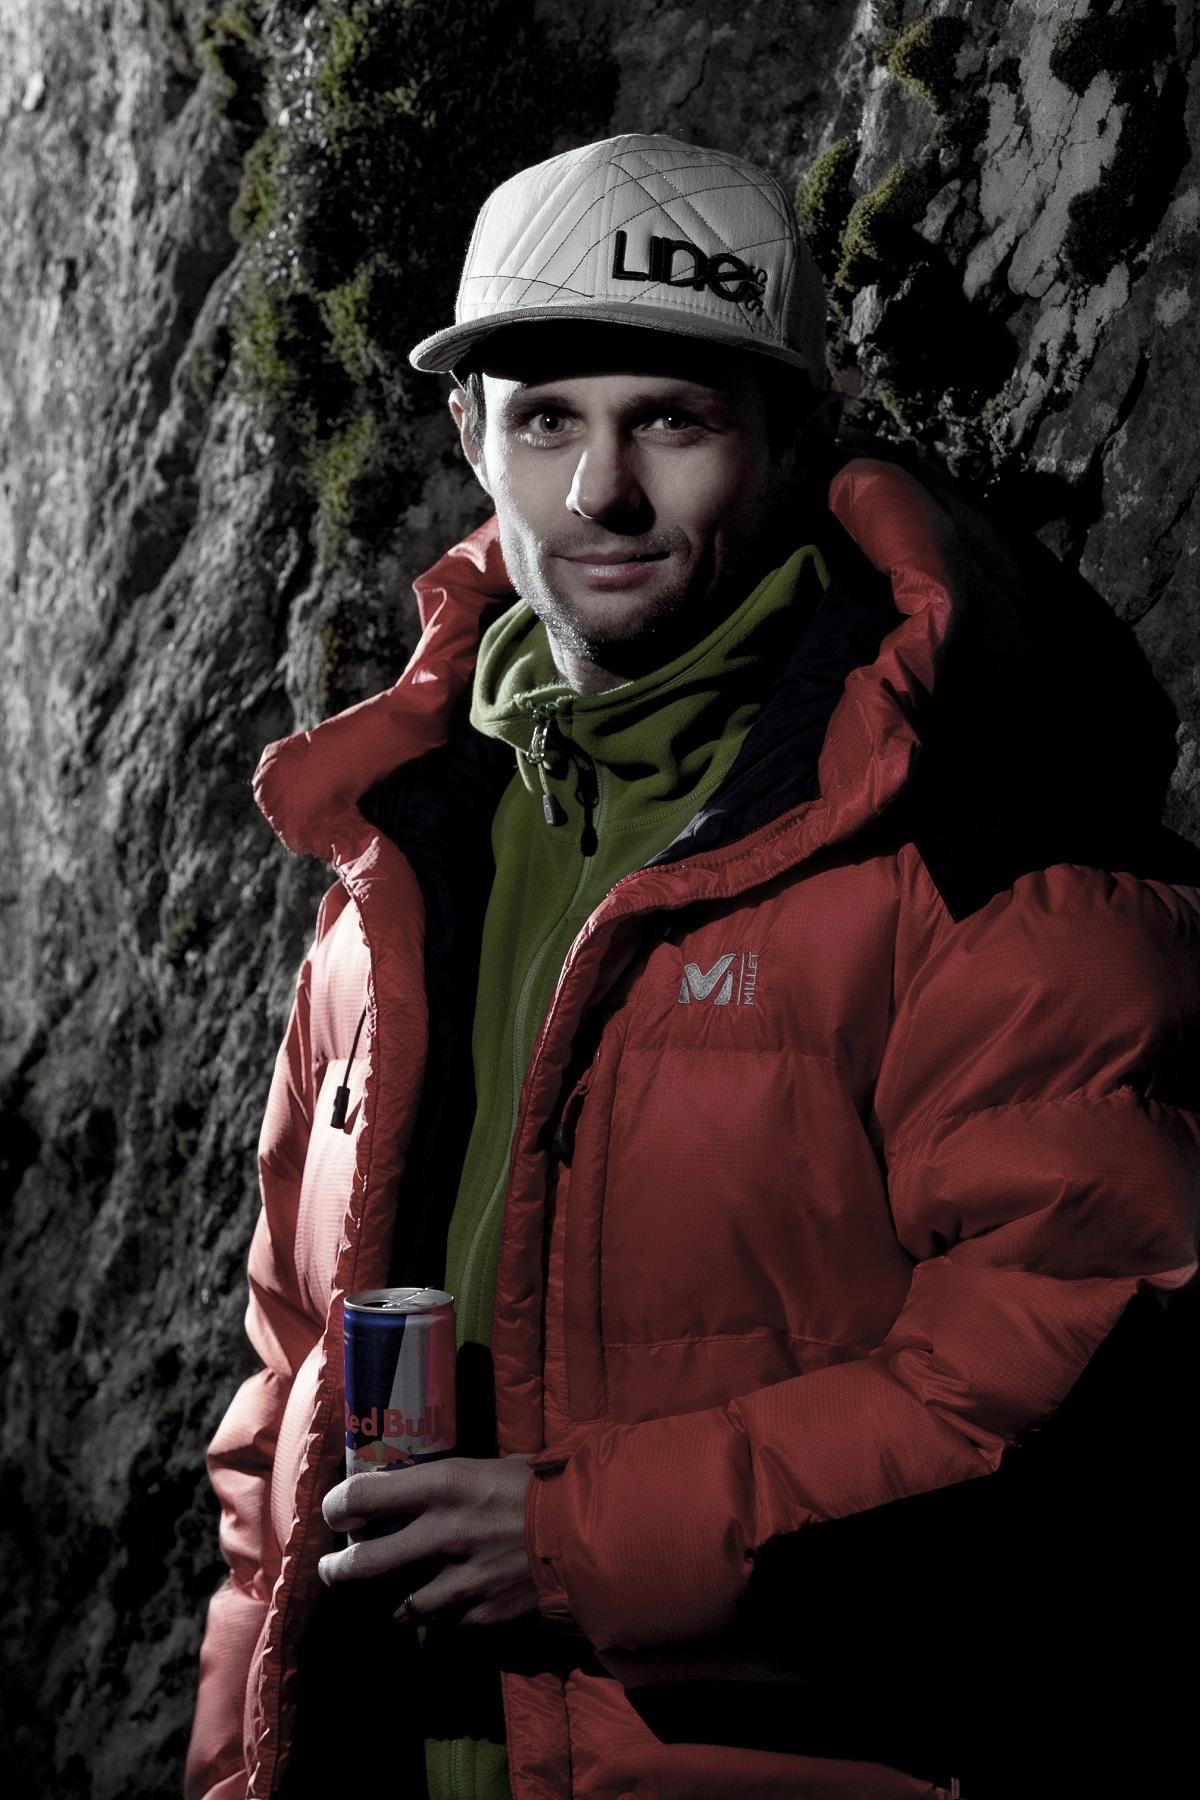 Robin Kaleta (fot. Robin Kaleta)